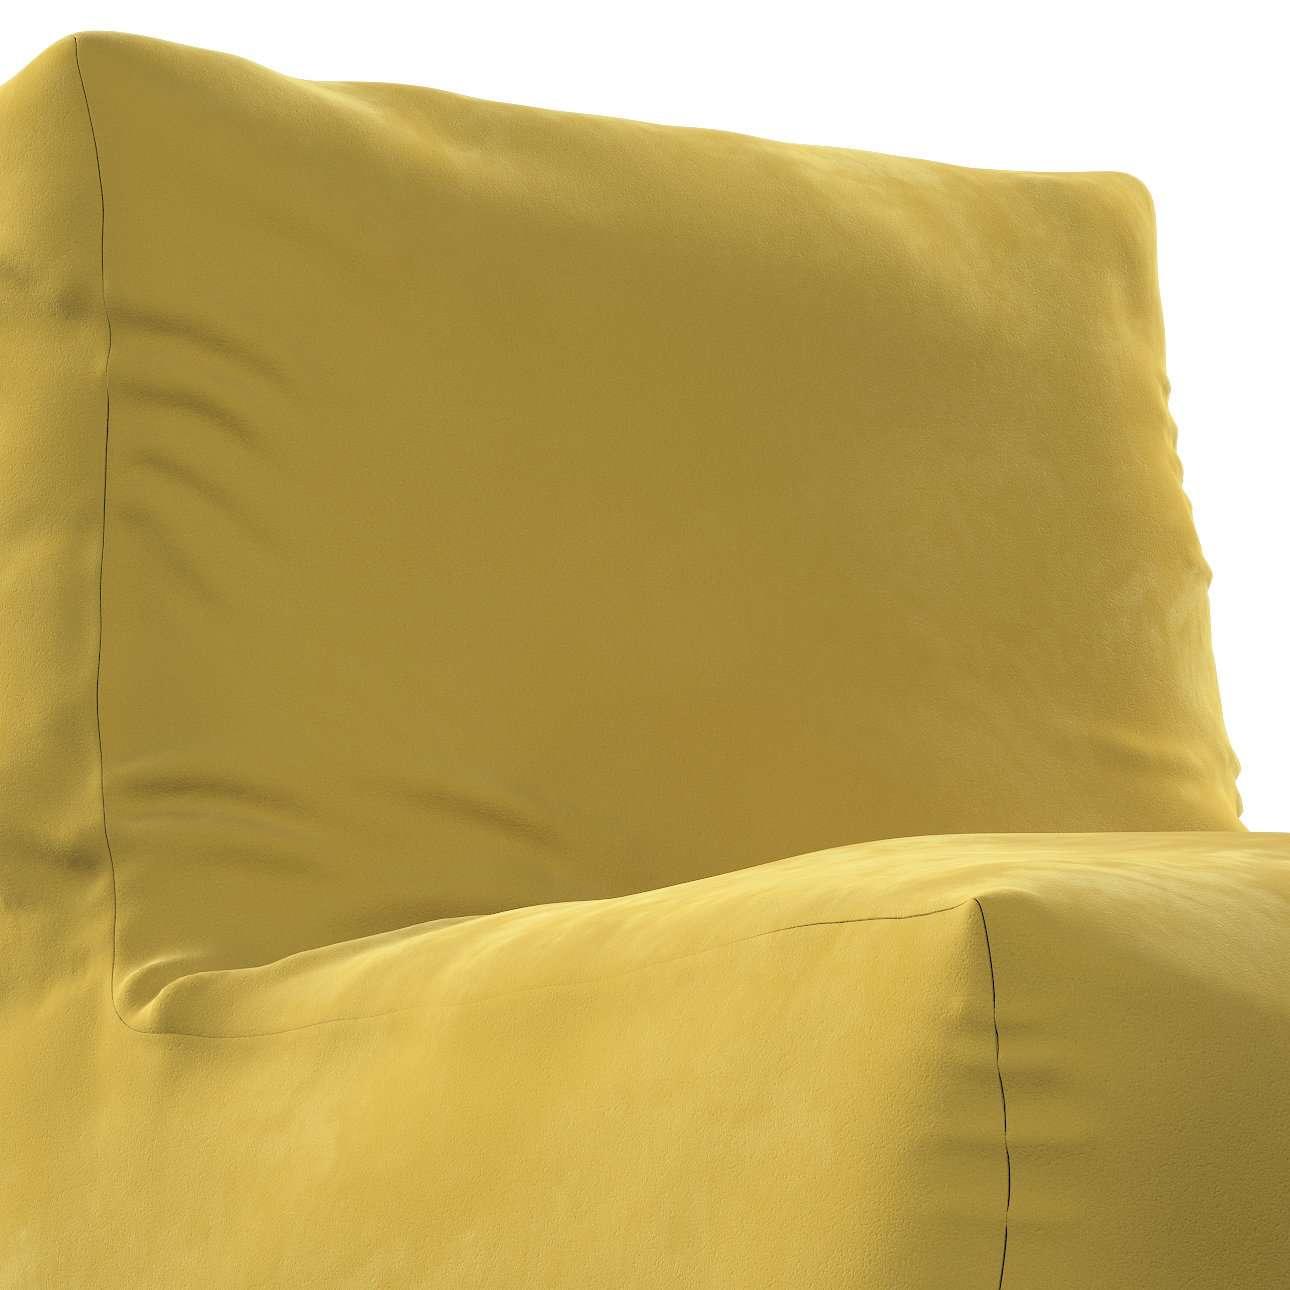 Pufa- fotel w kolekcji Velvet, tkanina: 704-27